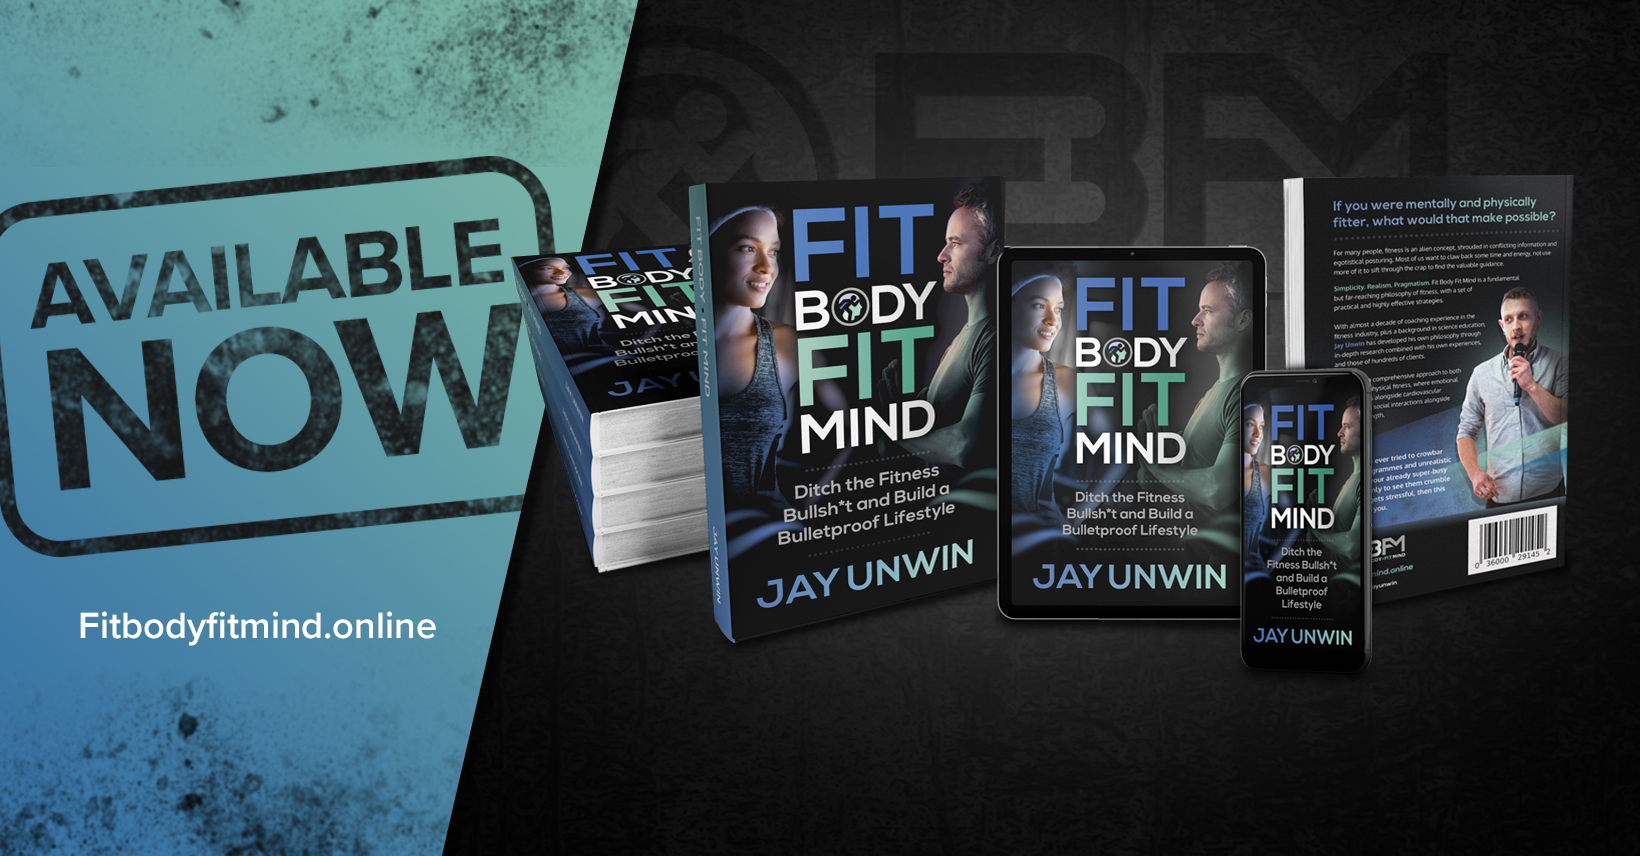 Fit Body Fit Mind book